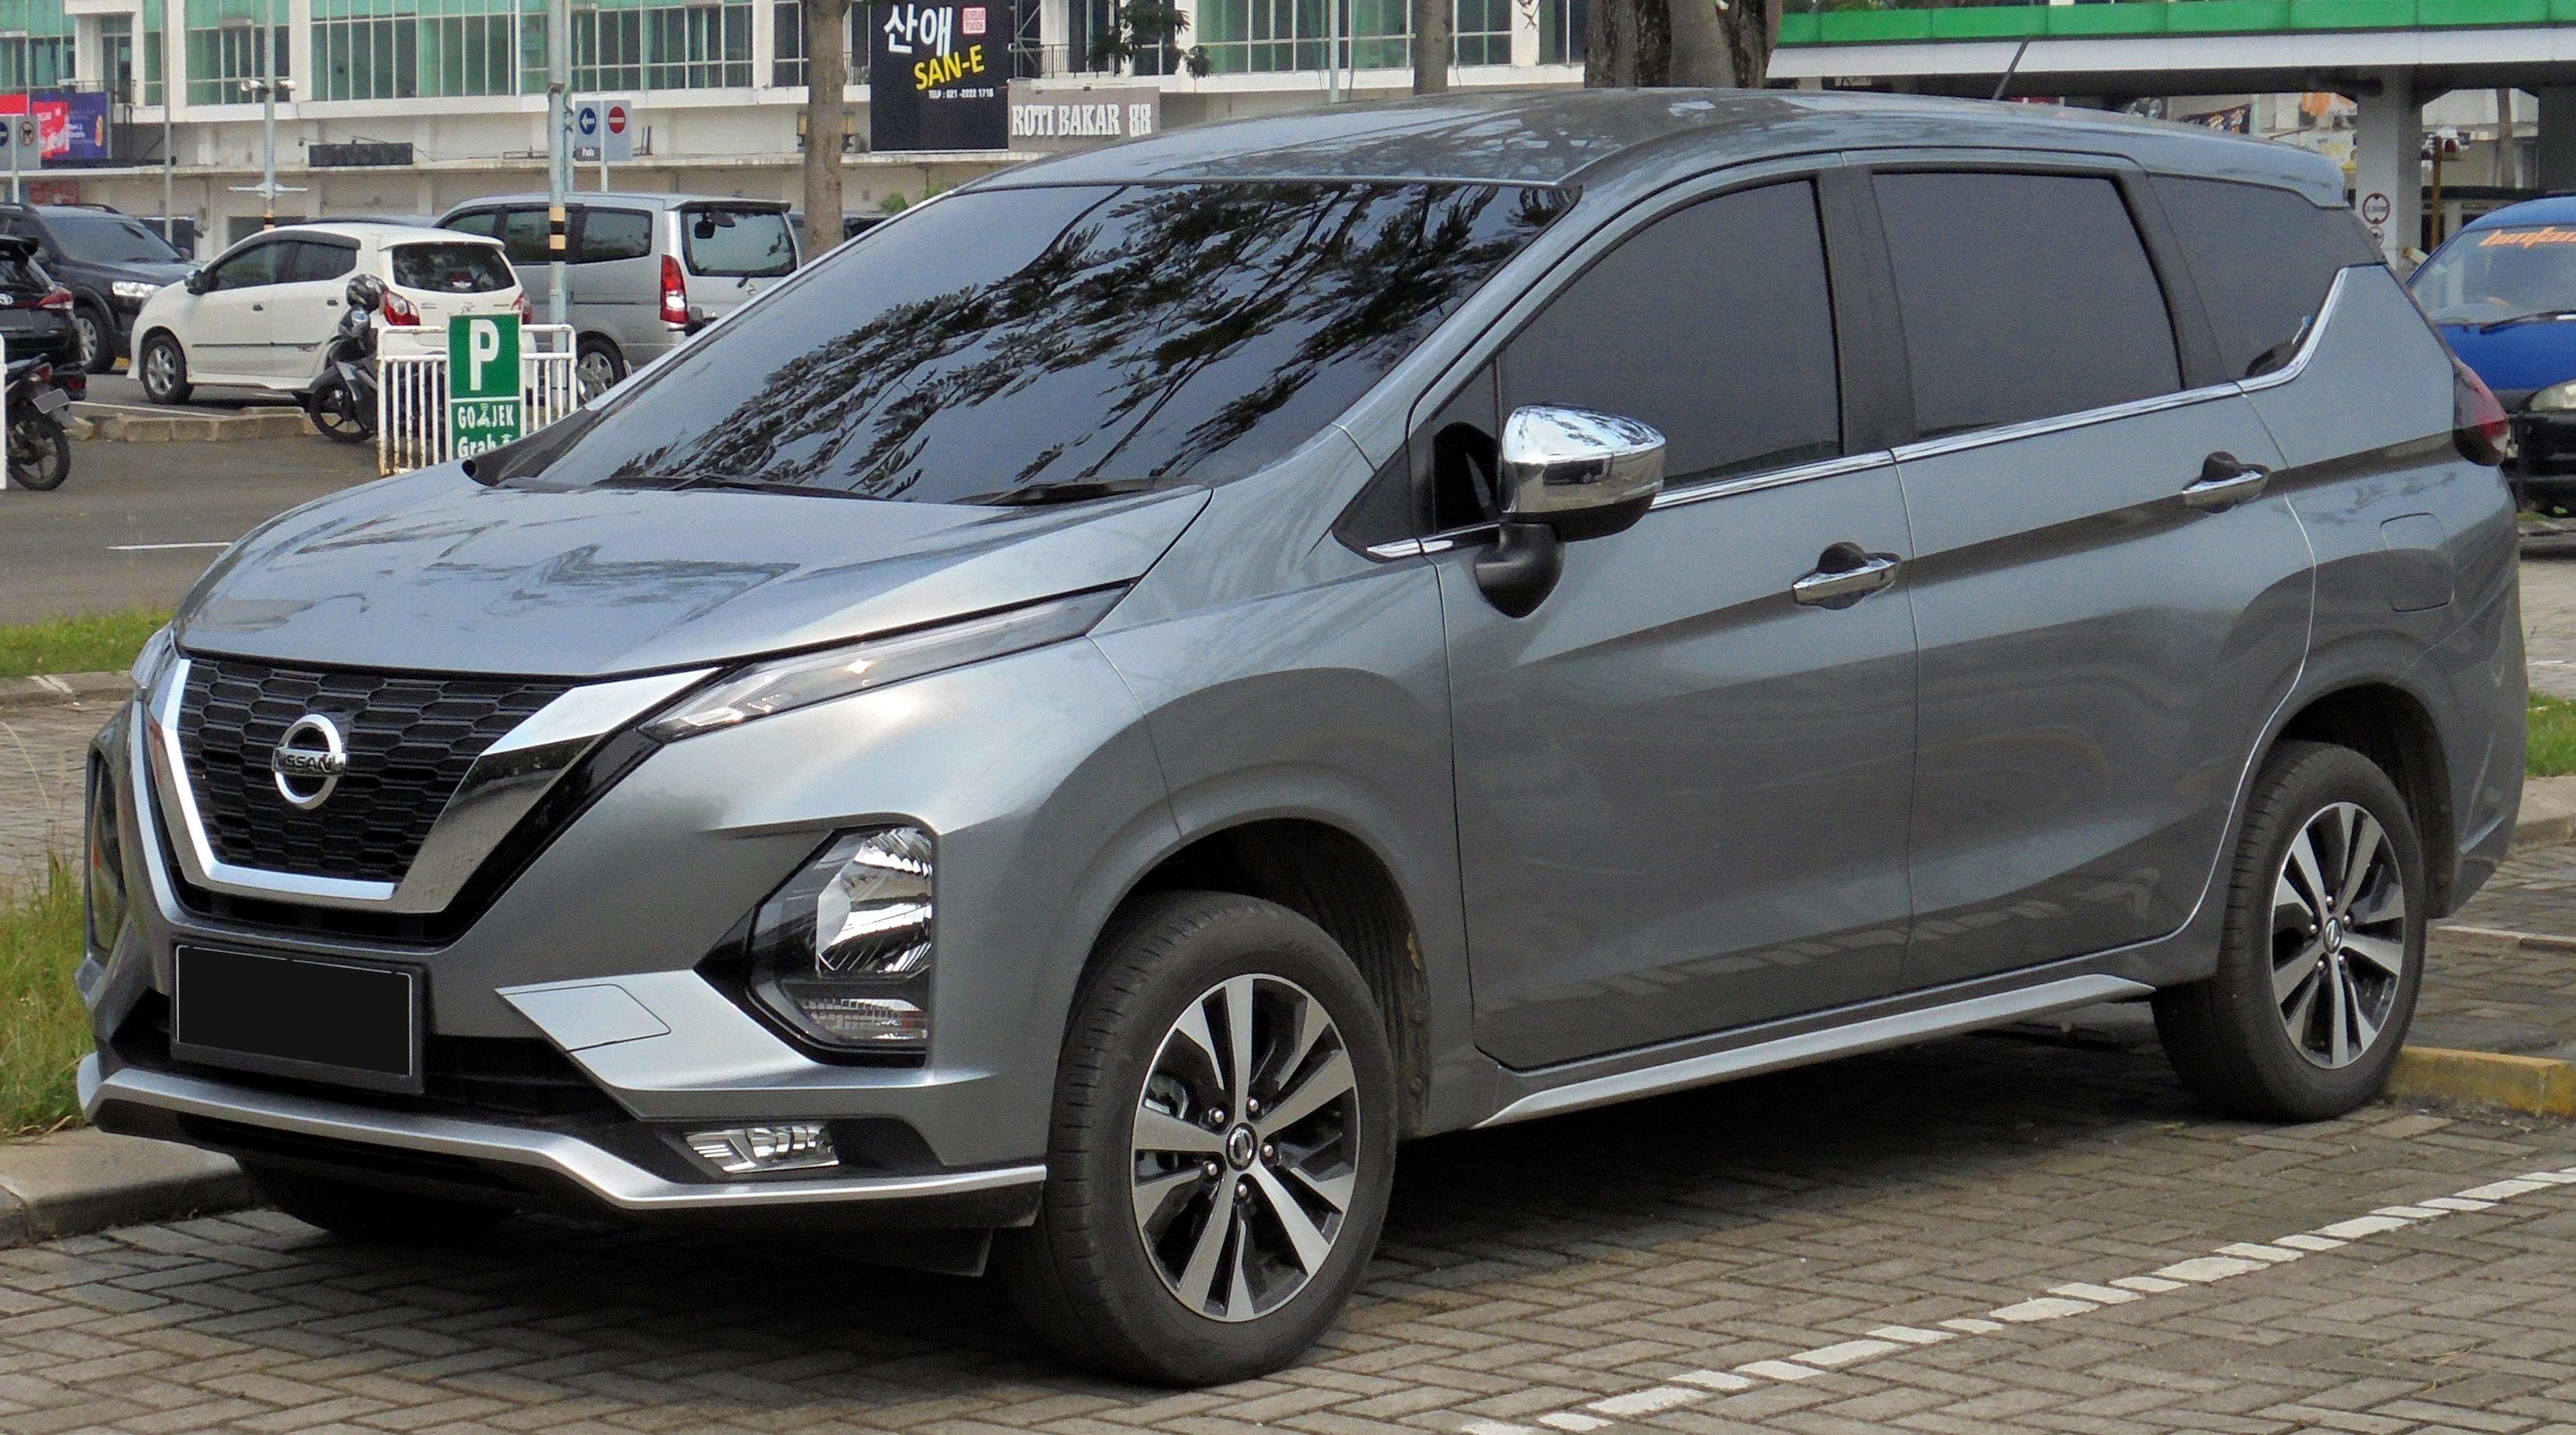 Berkas:2019 Nissan Livina VL 1.5 ND1W (20190616) 01.jpg